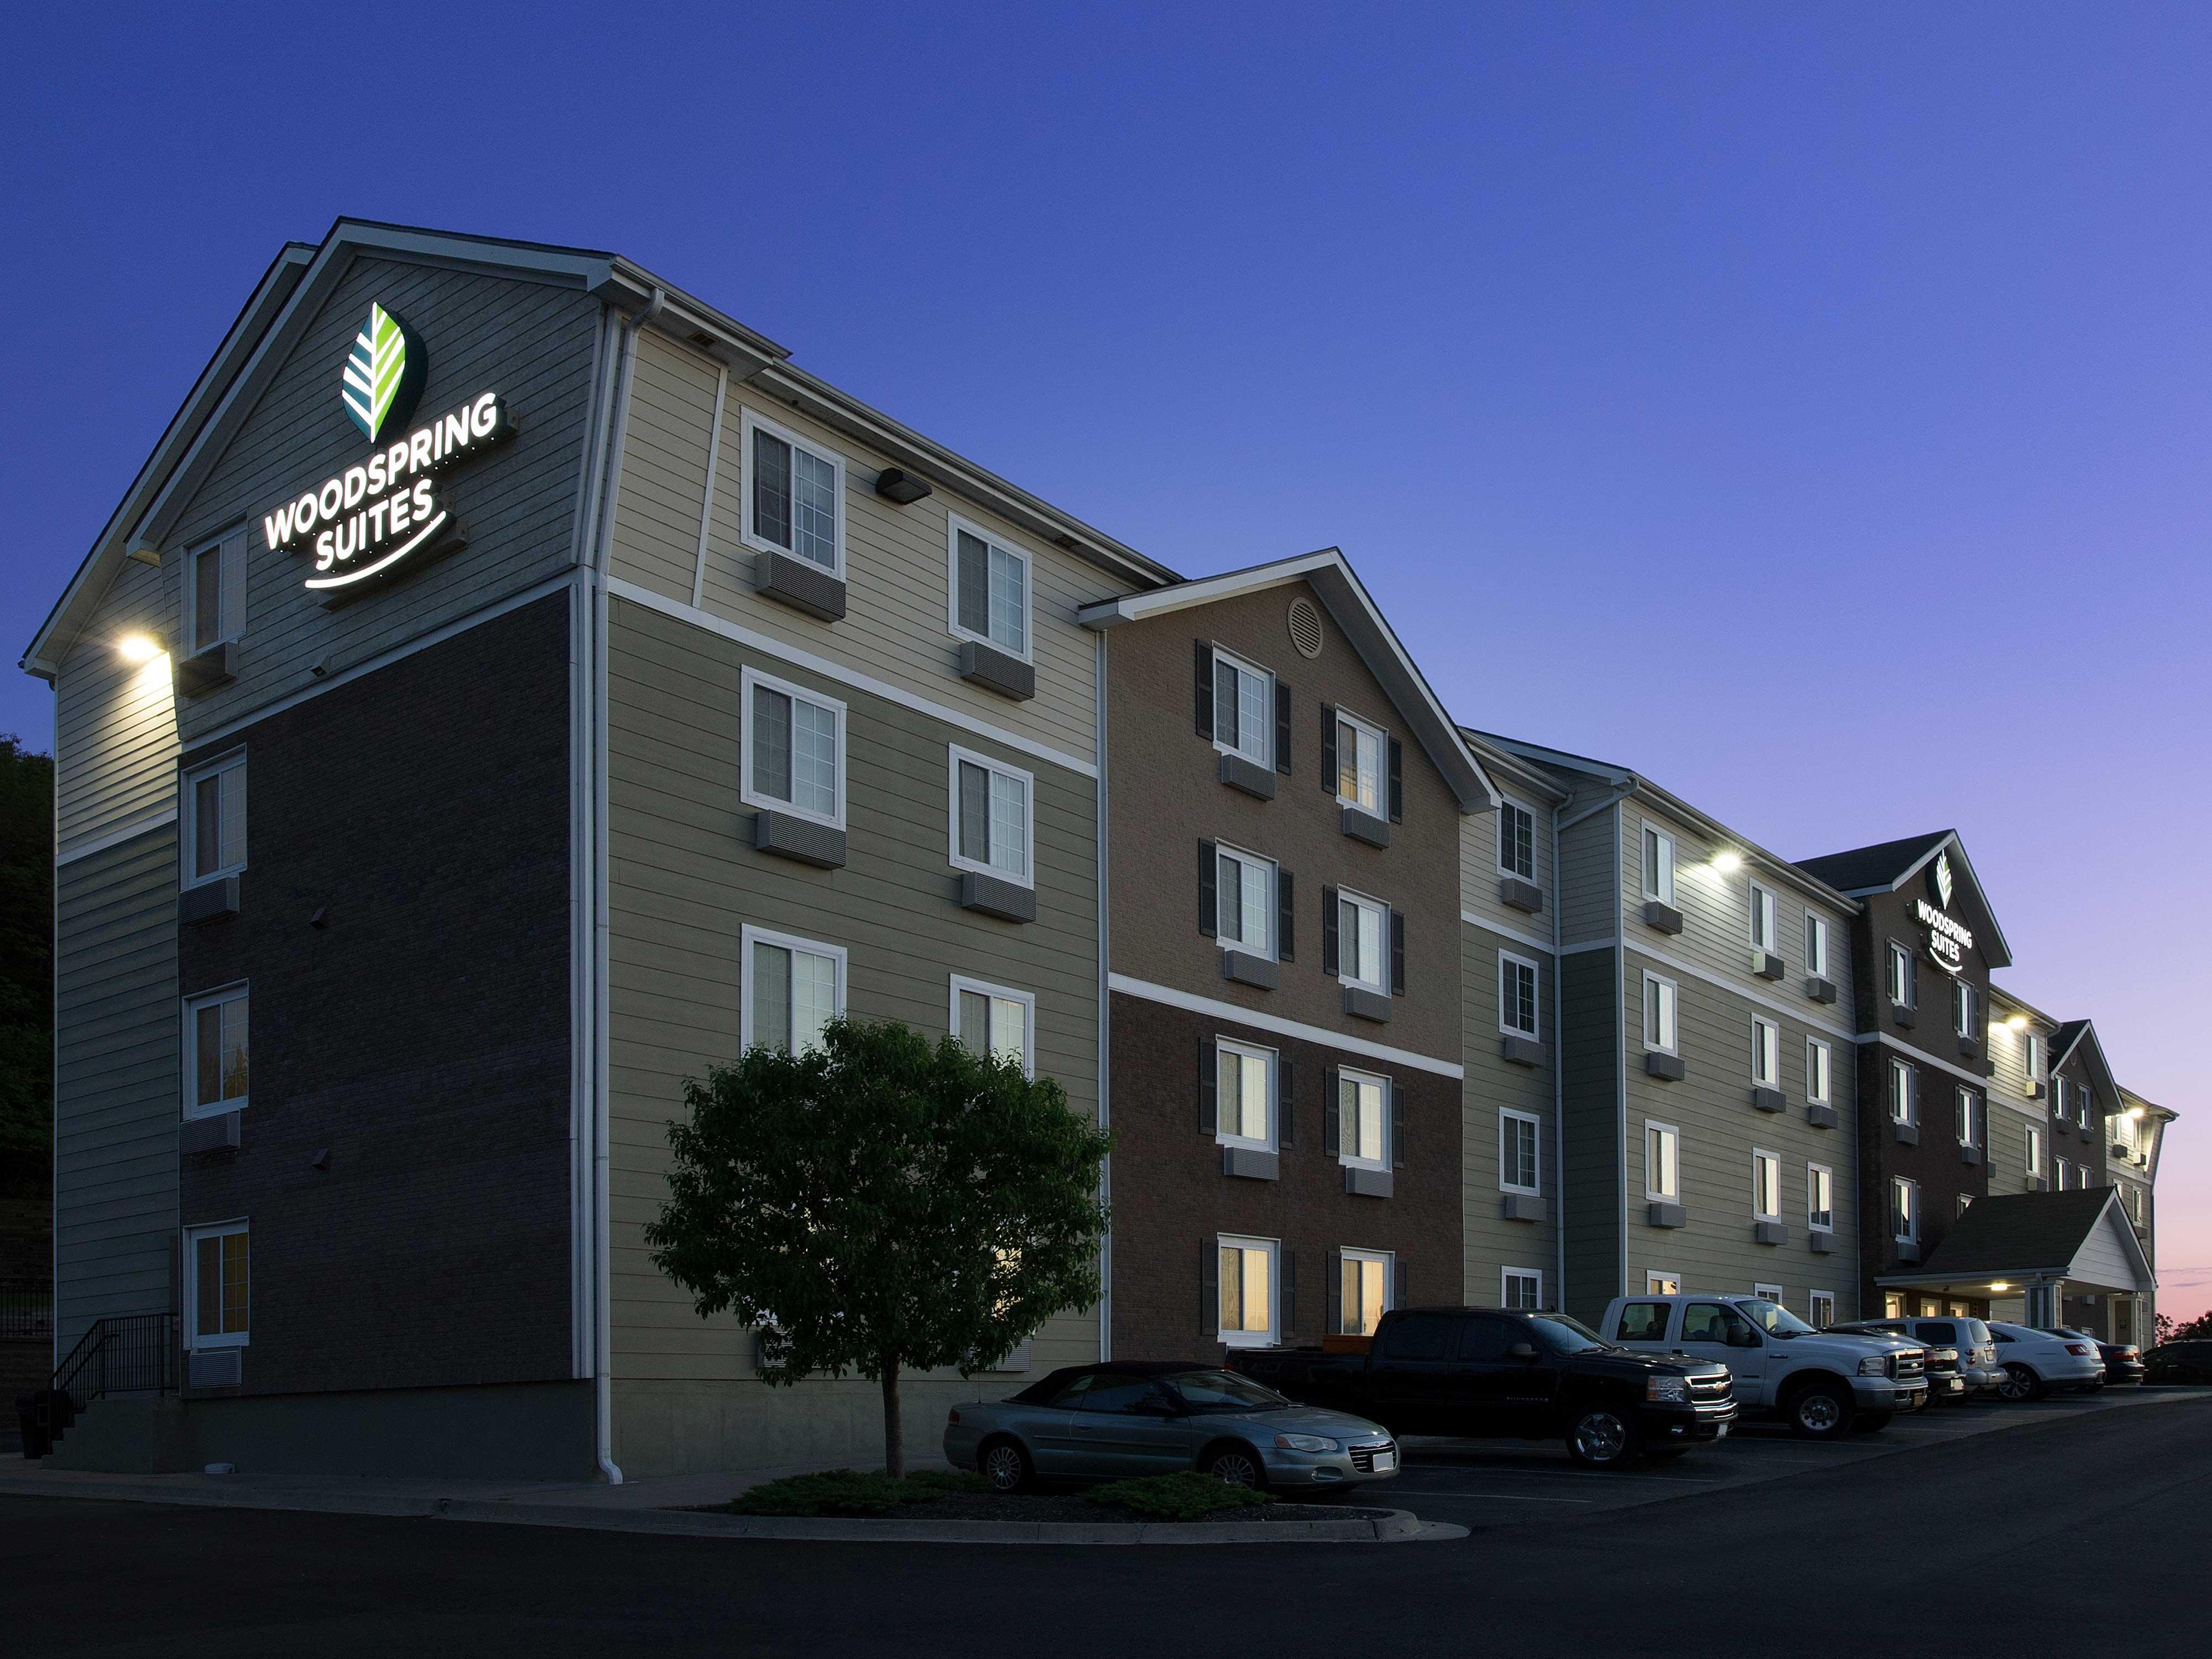 WoodSpring Suites Kansas City Mission image 3